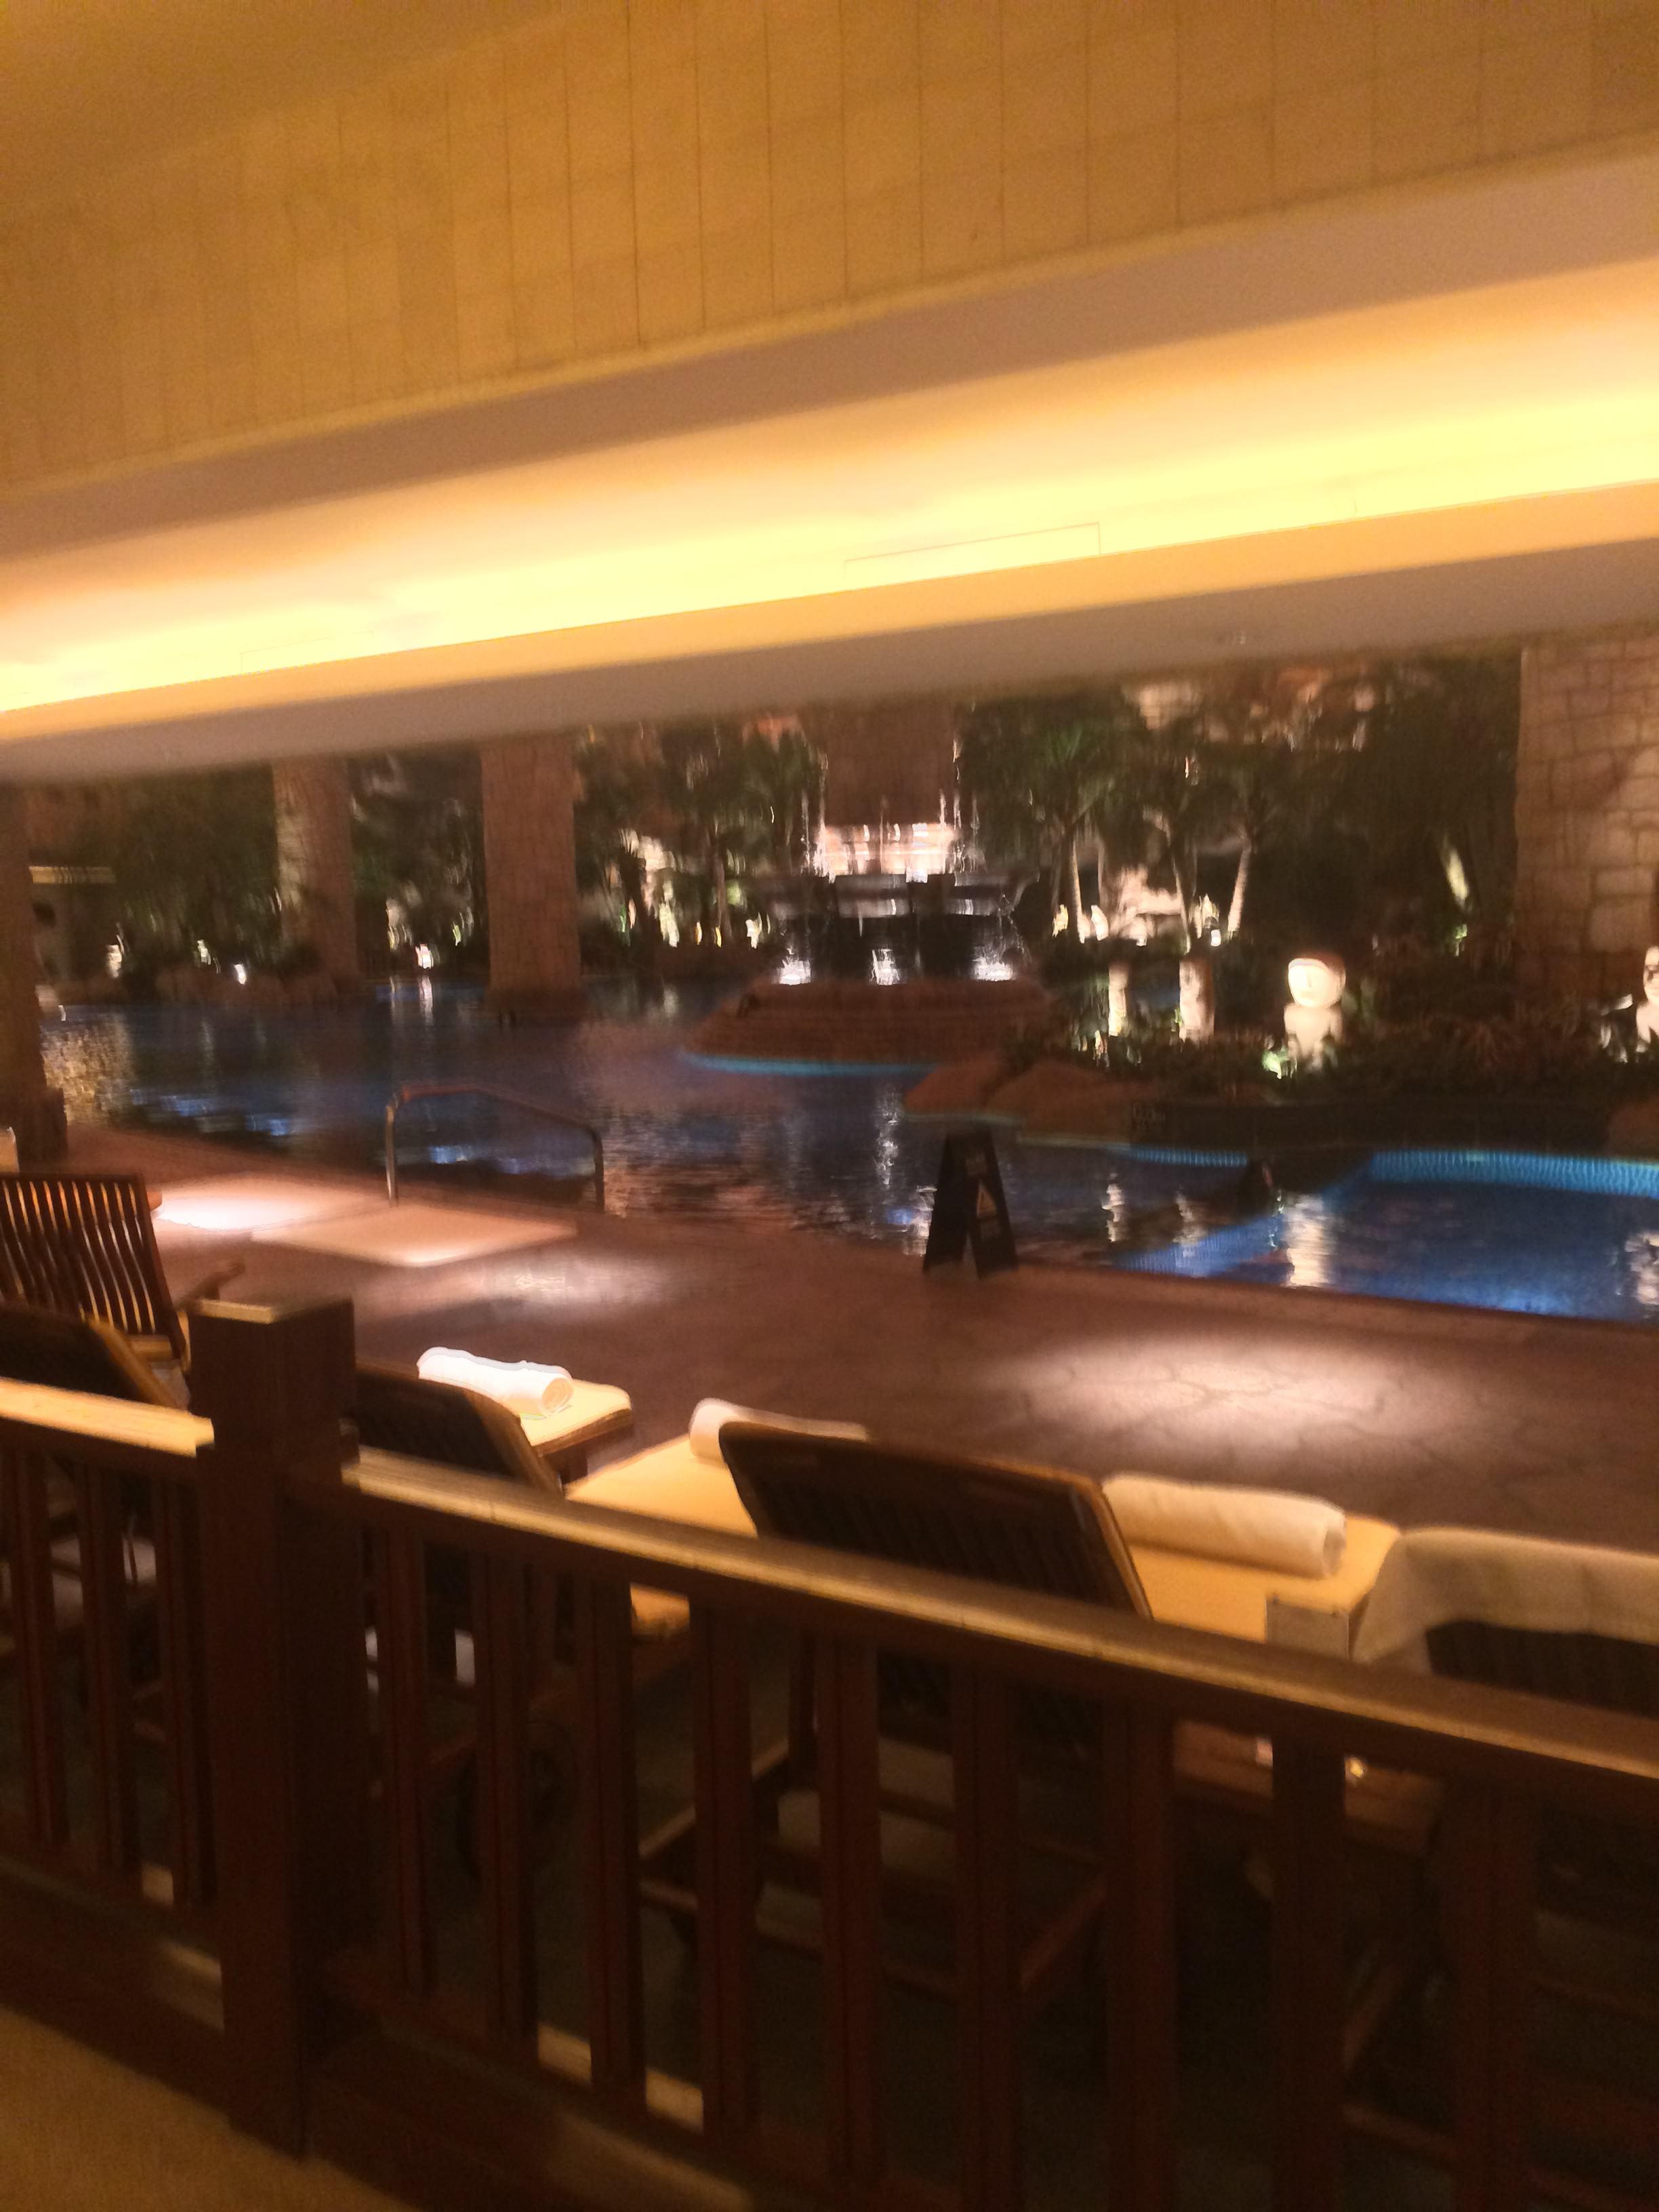 Pool at grand hyatt beijing jazz piano school for Grand hyatt beijing swimming pool